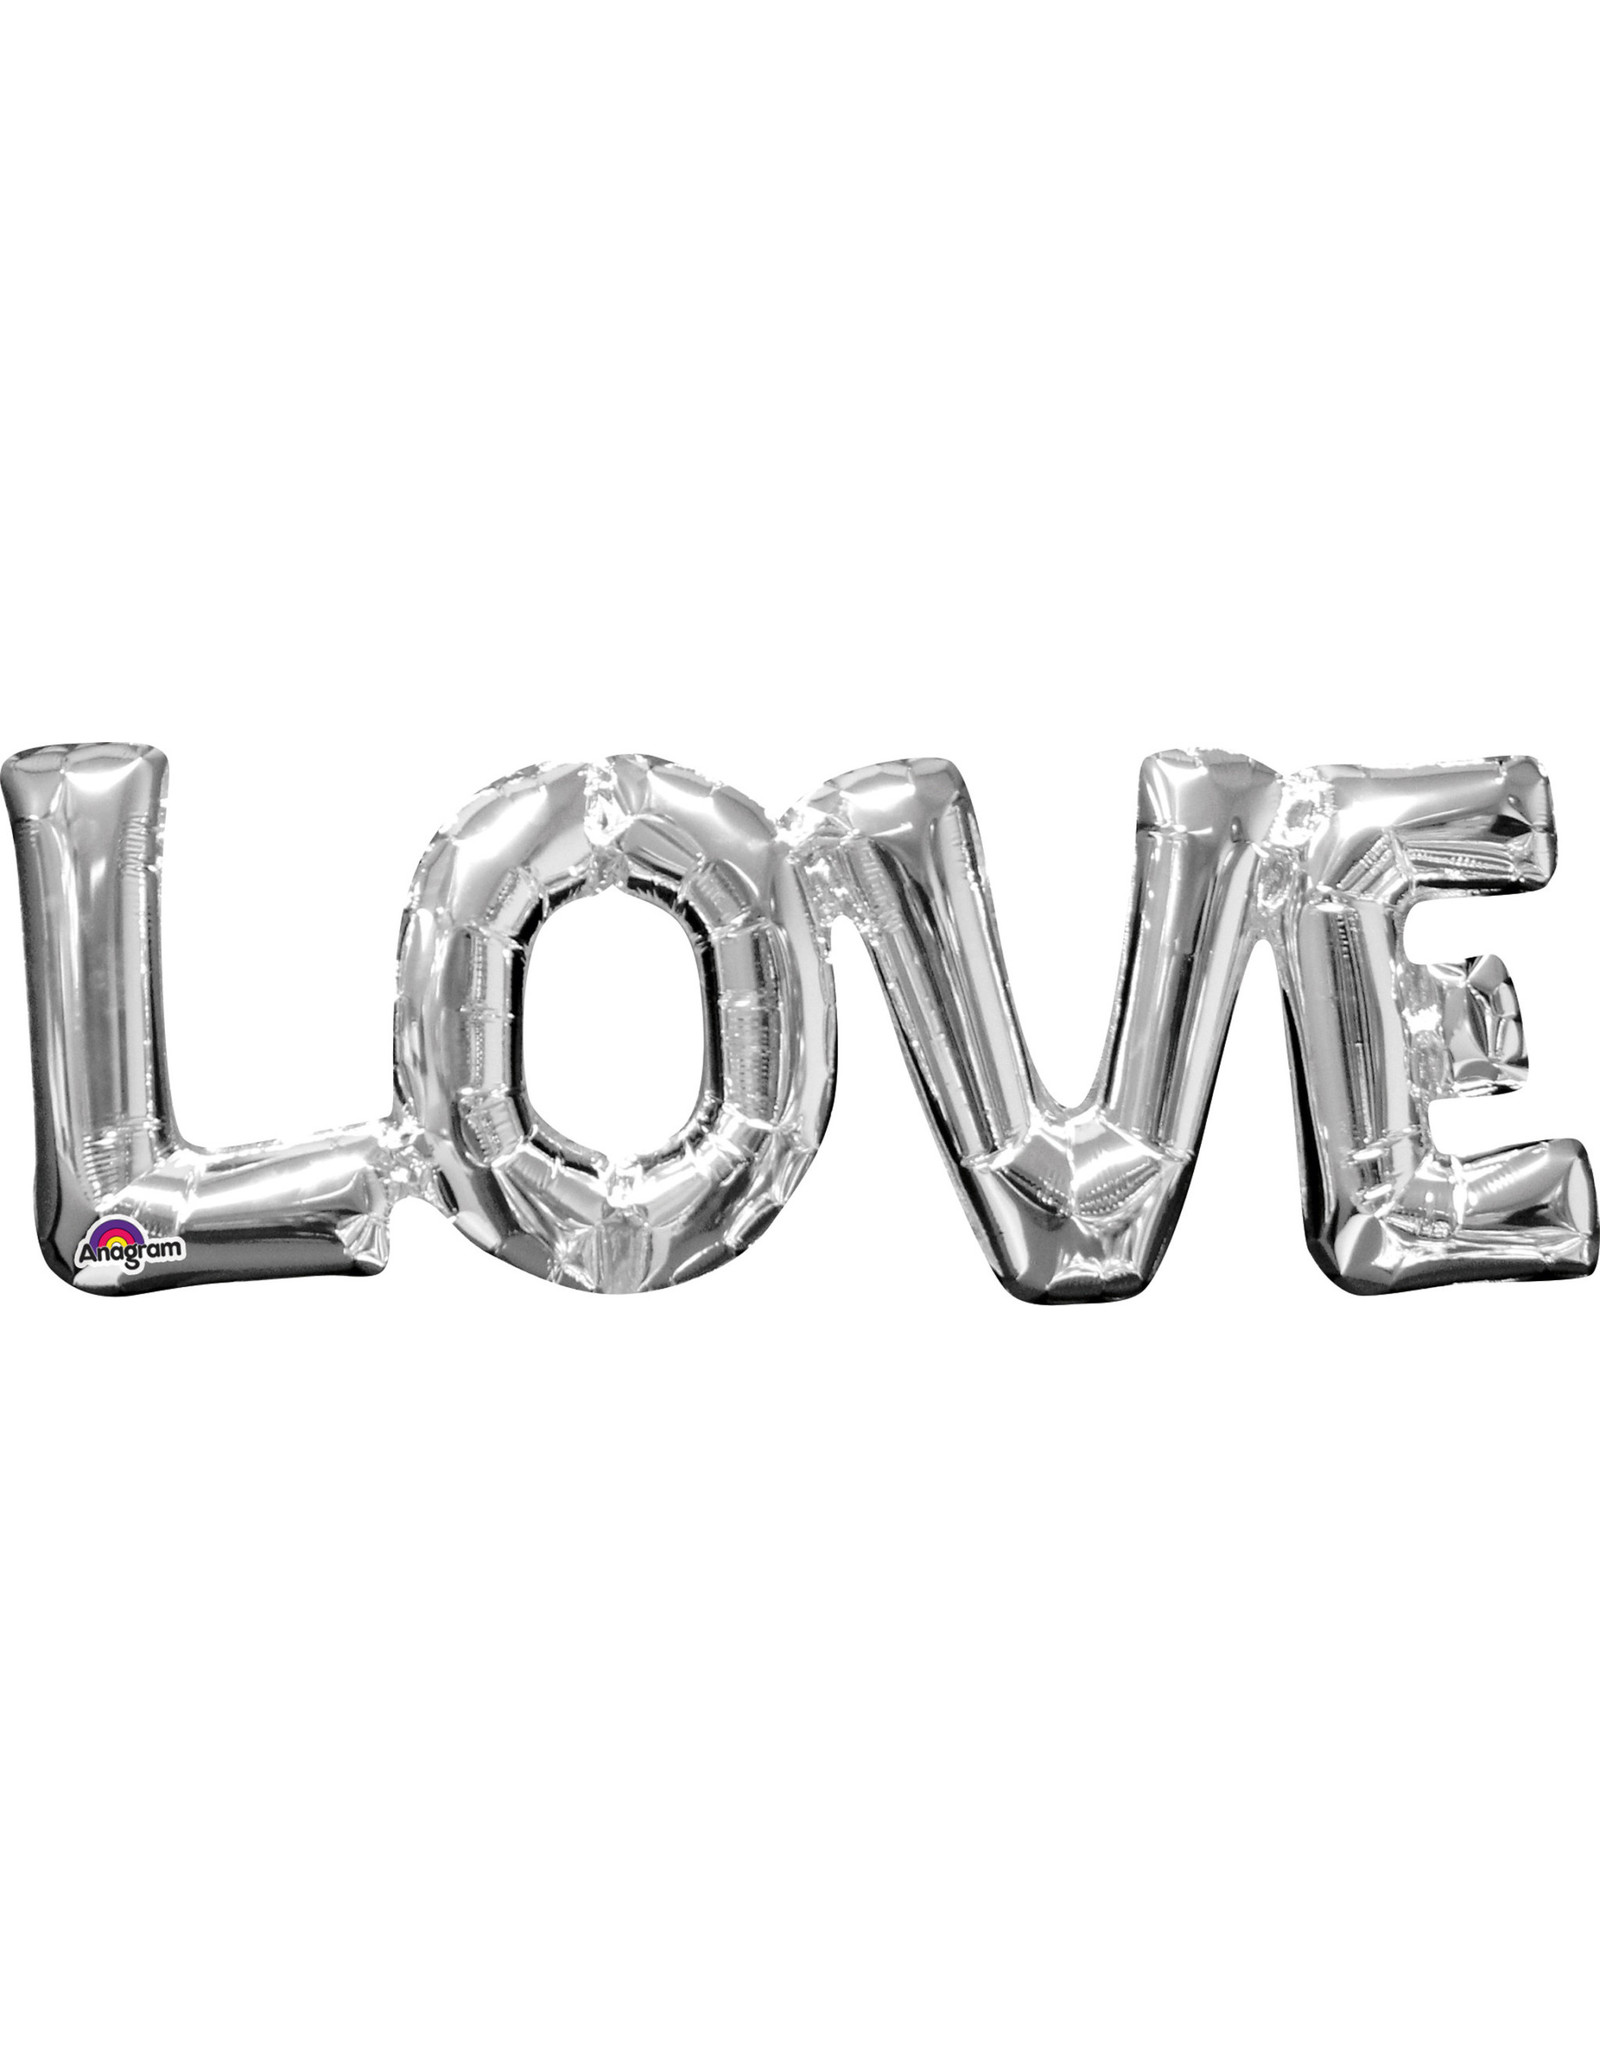 Amscan folieballon Air-filled zilver LOVE